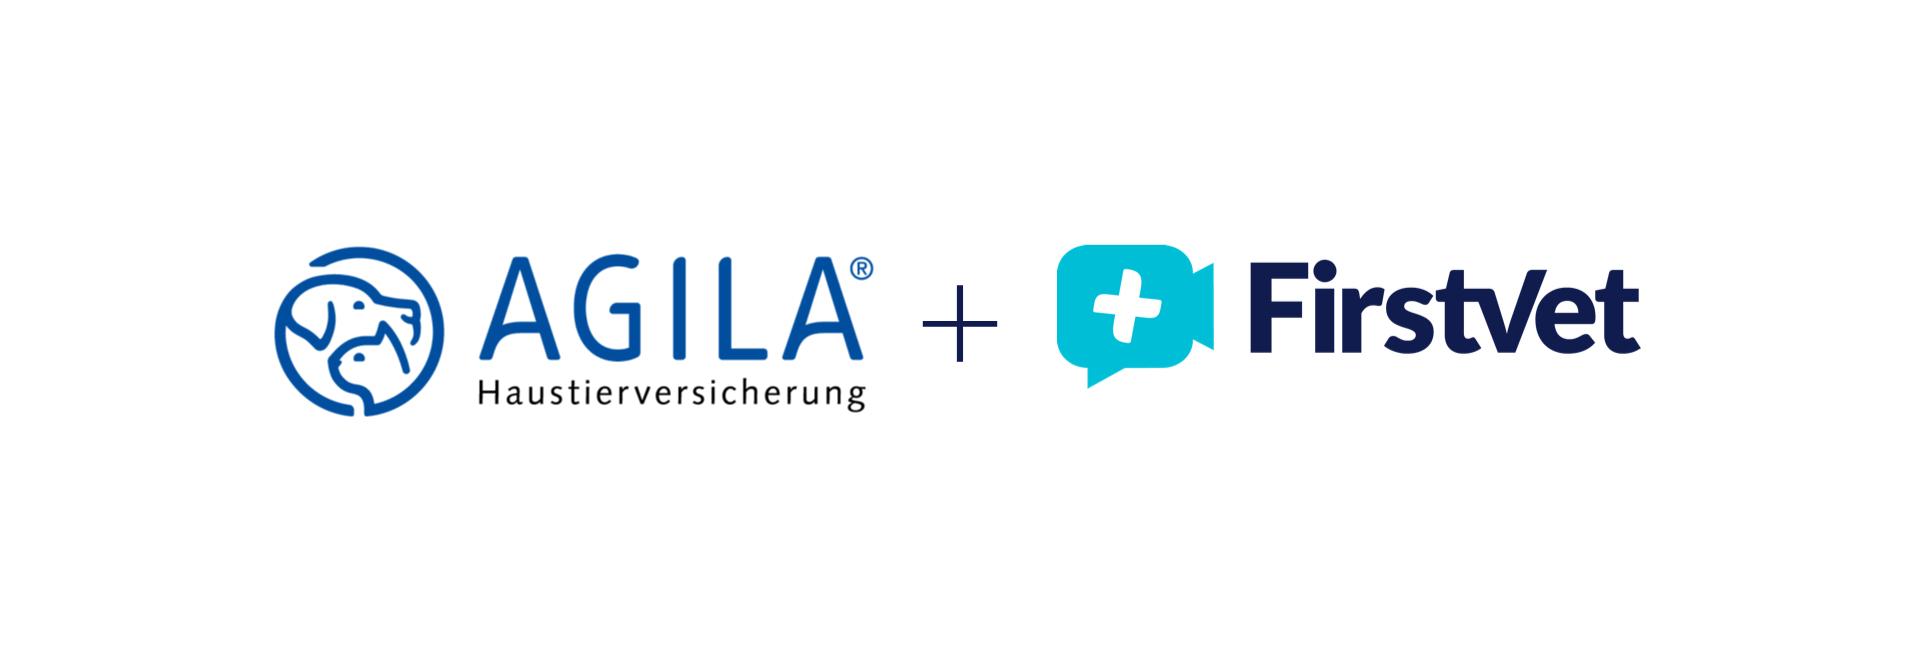 Agila FV WEB HEADER